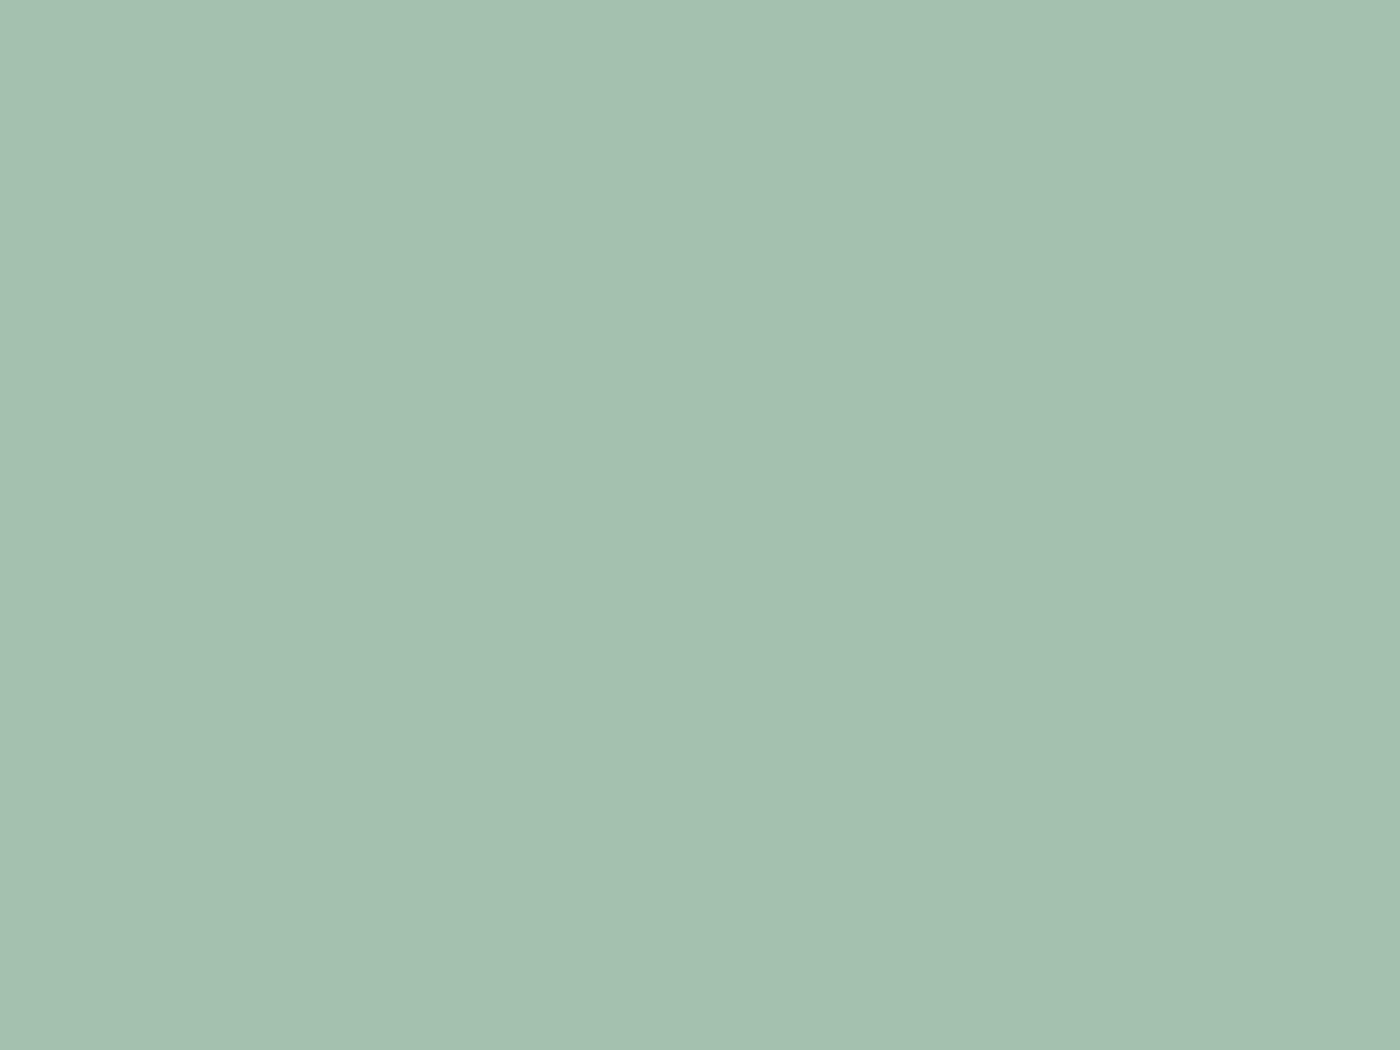 1400x1050 Cambridge Blue Solid Color Background